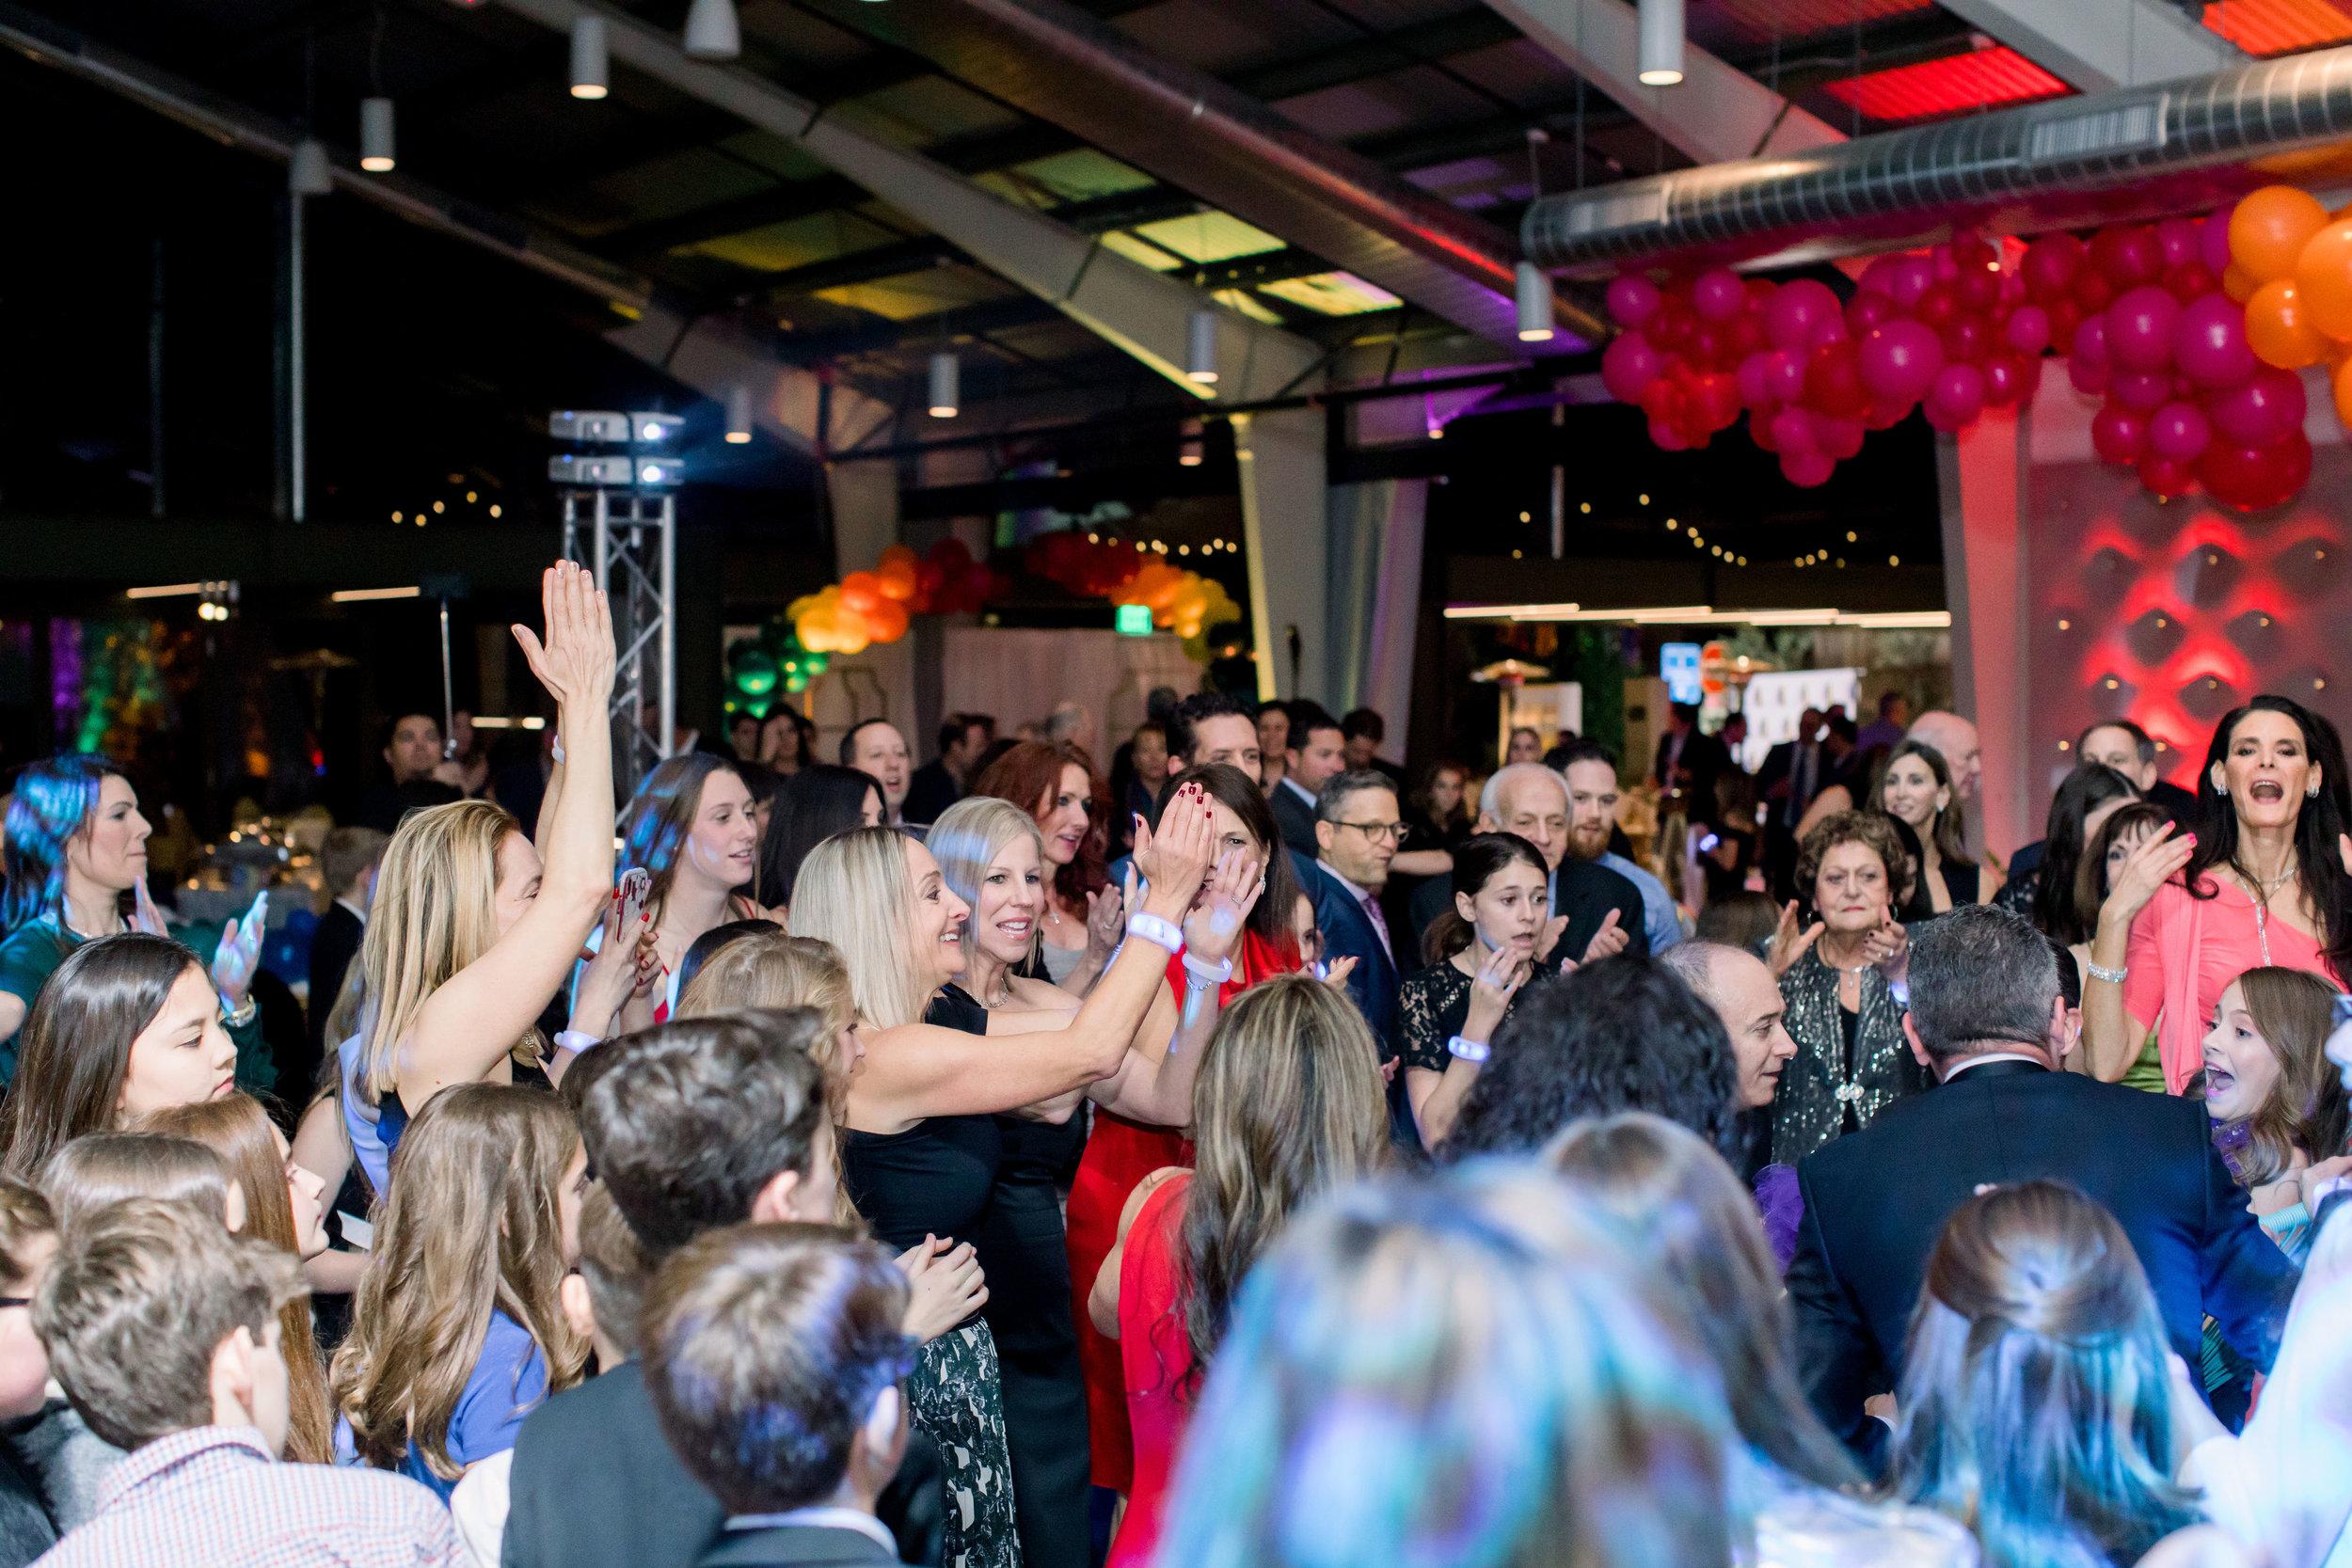 37 rainbow bat mitzvah dance party guests dance hora lift chair Life Design Events photos by Stephanie Heymann Photography.jpg